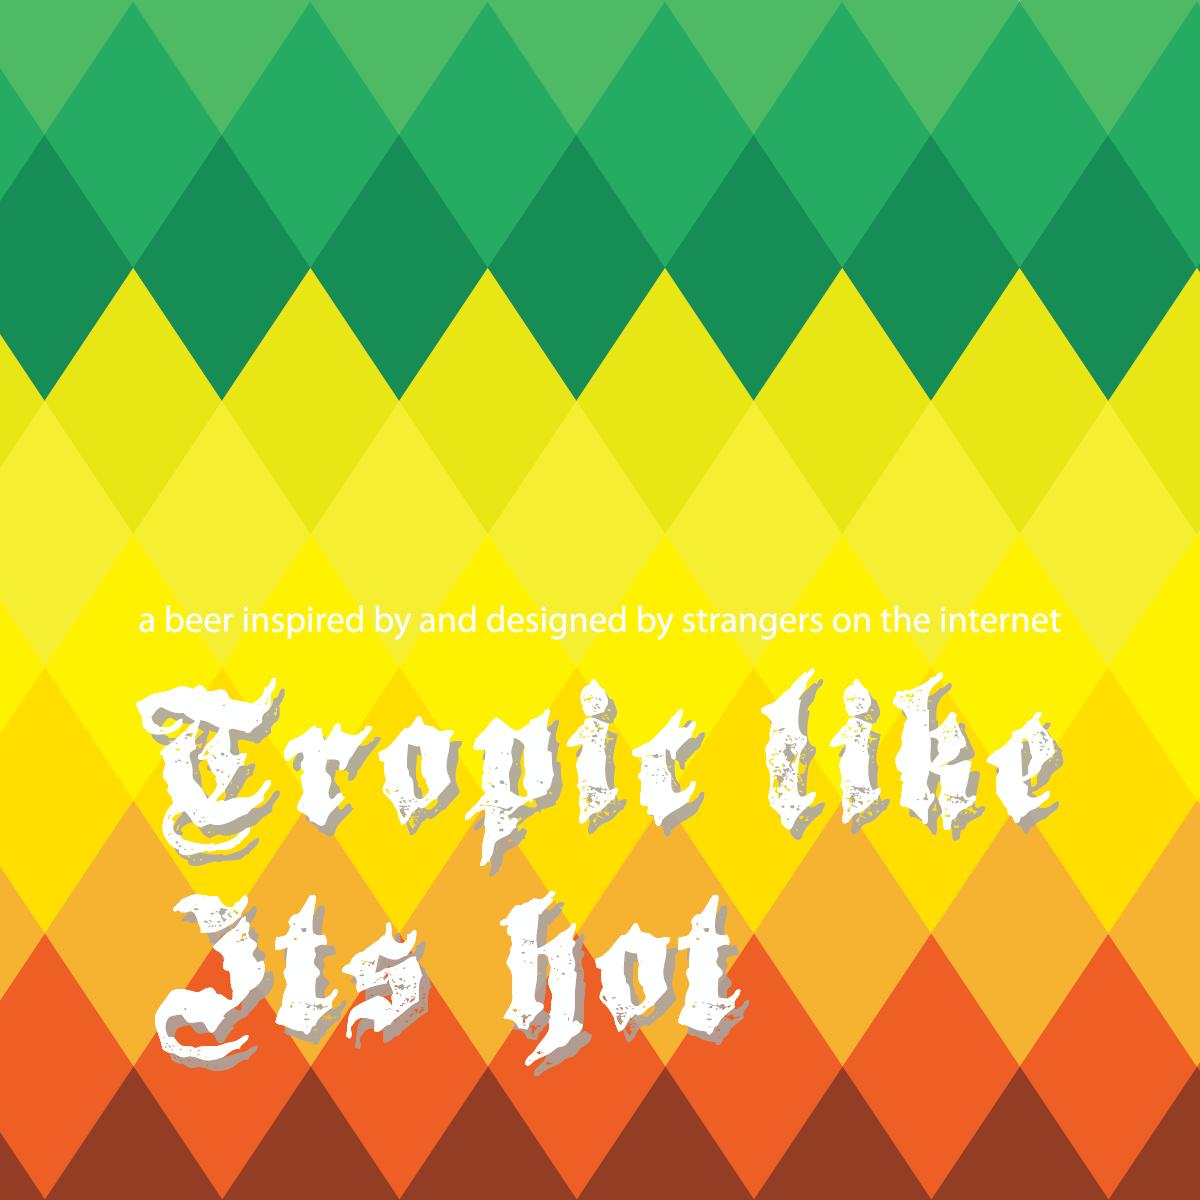 WebTab_TropicLikeItsHot_TheShopBeerCo_TempeAZ-01.png